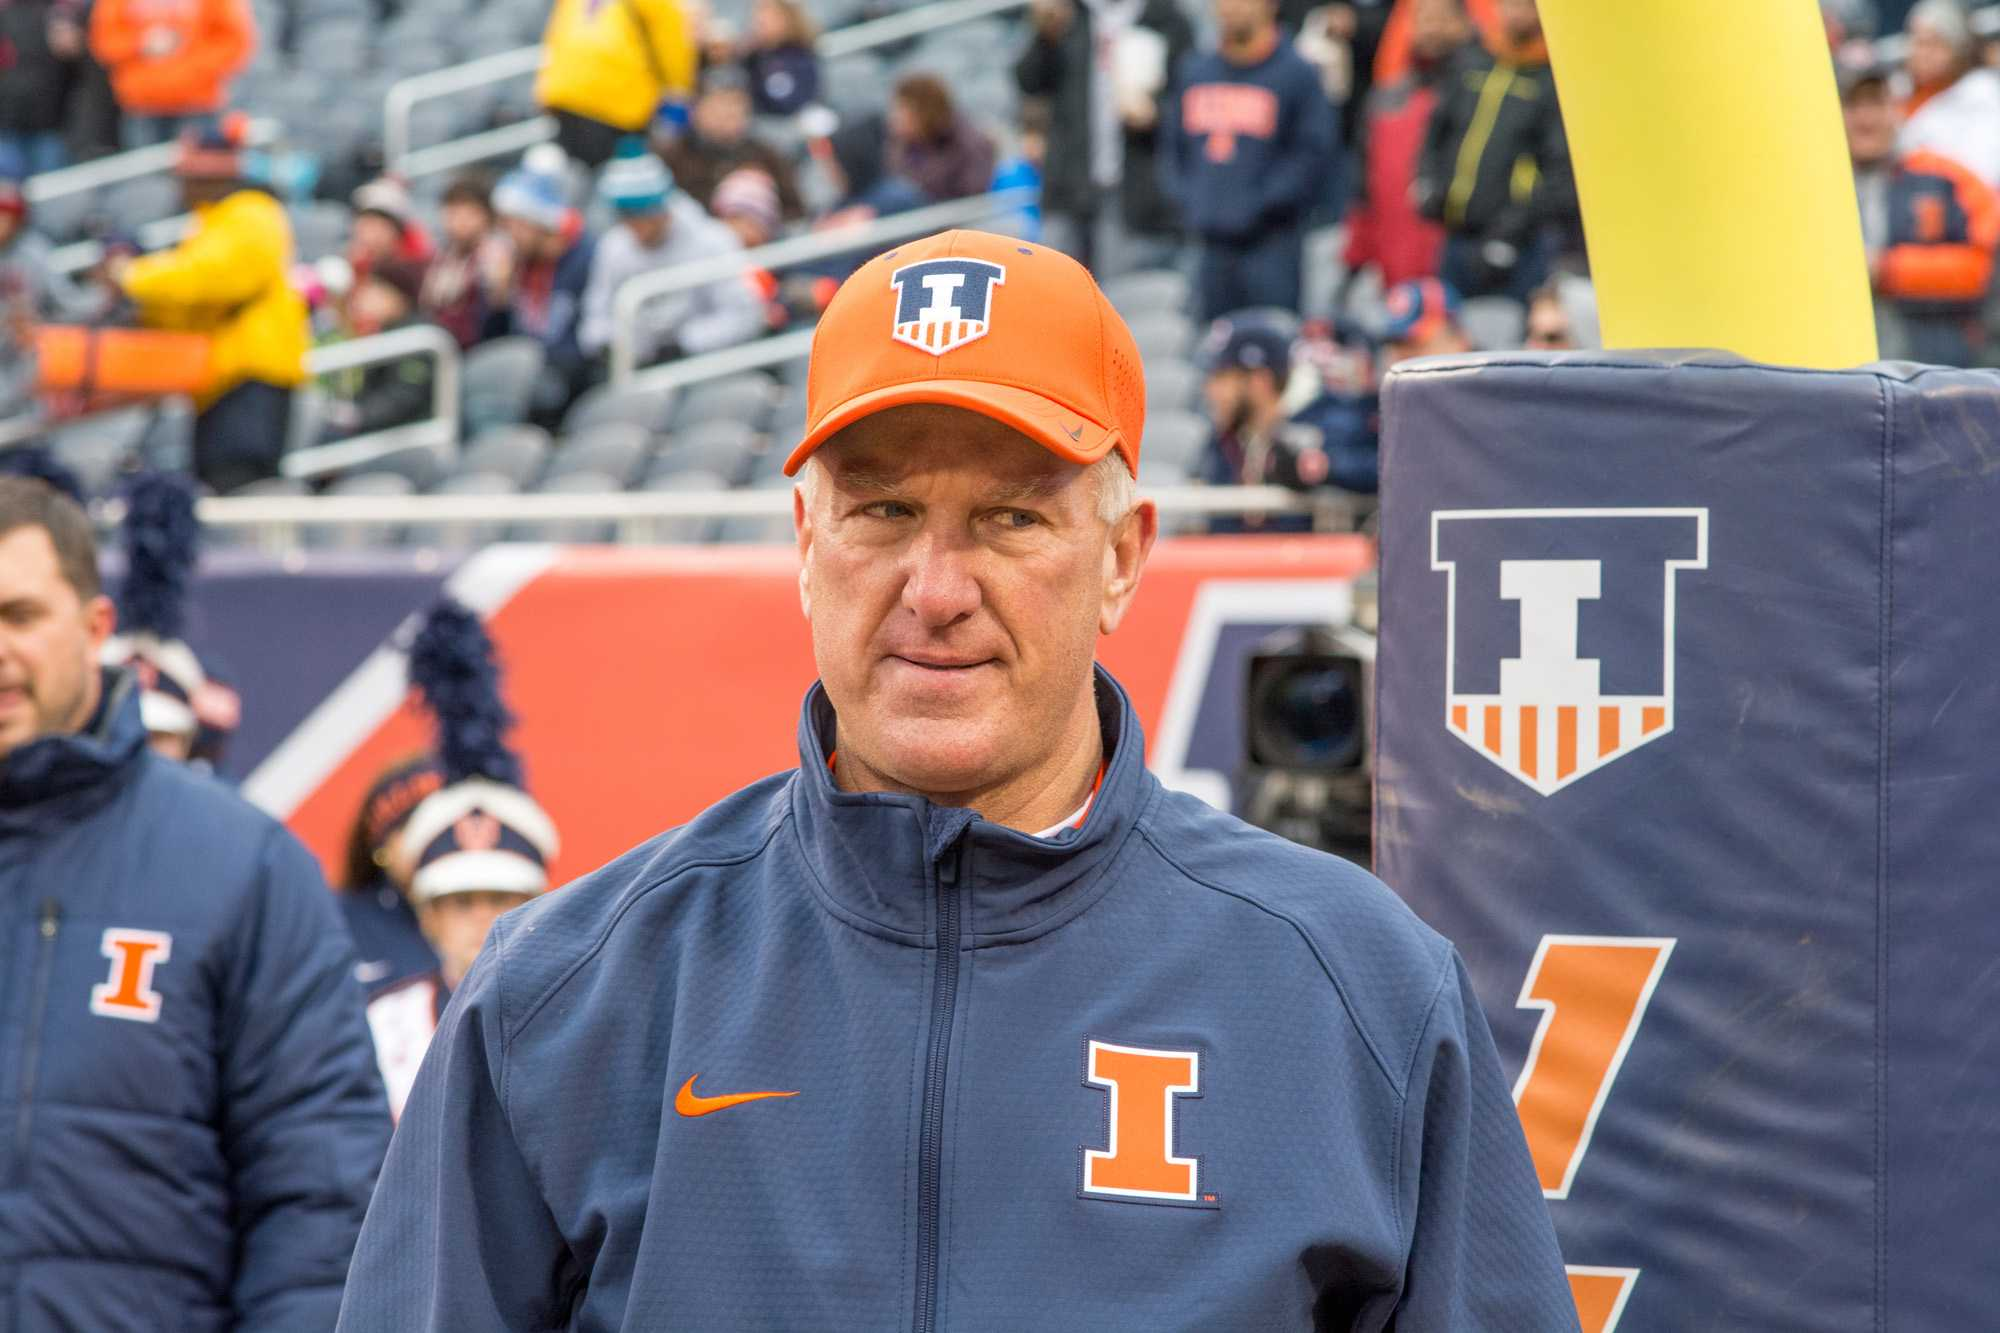 The+Daily+Illini+Sports+Staff+breaks+downs+the+firing+of+Illinois+Head+Football+Coach+Bill+Cubit.